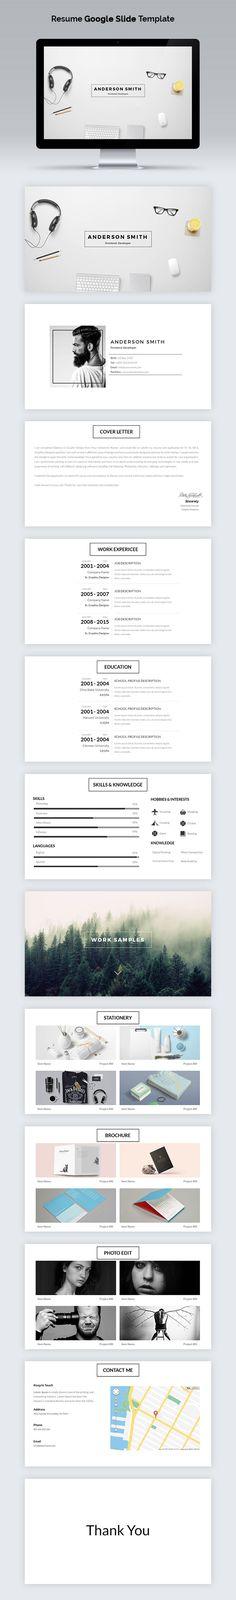 MD Clean Multipurpose Google Slides Template - google templates resume